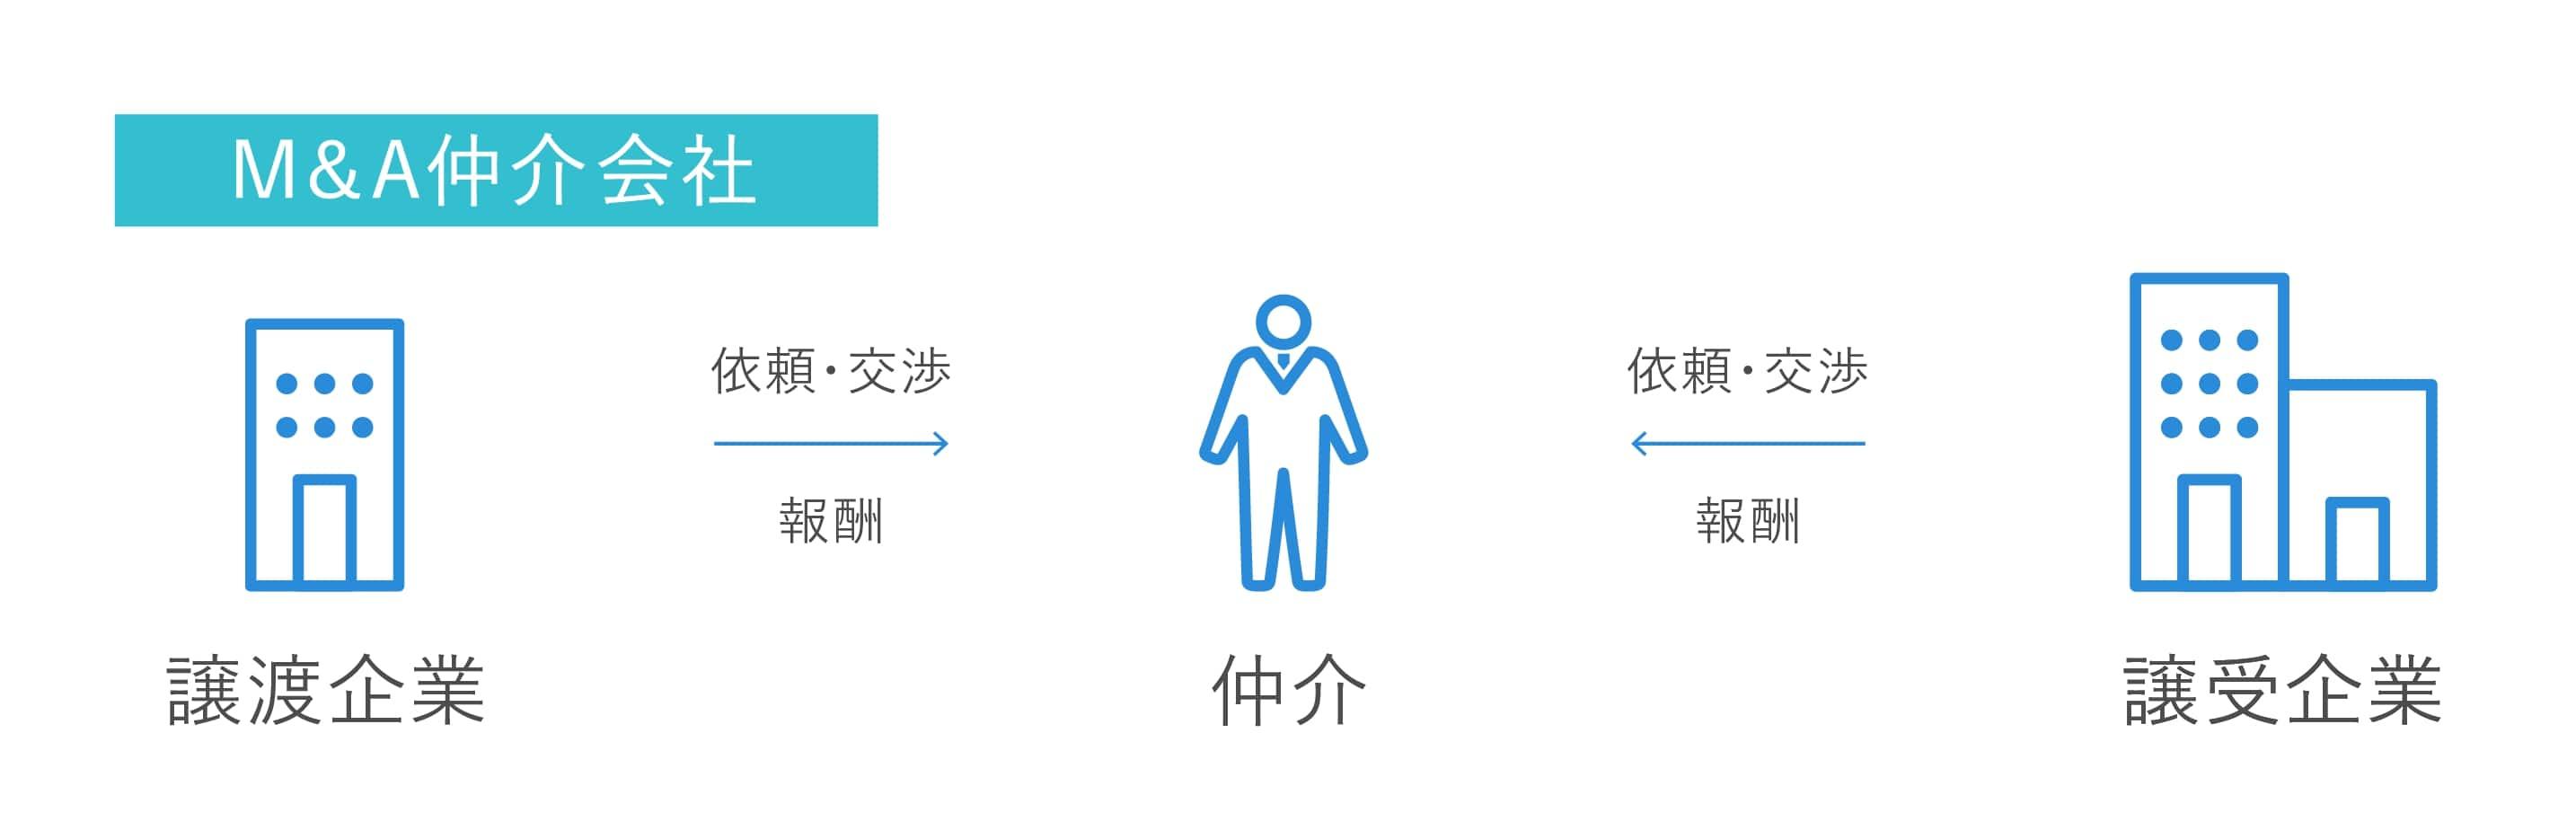 M&A仲介の業務内容と役割